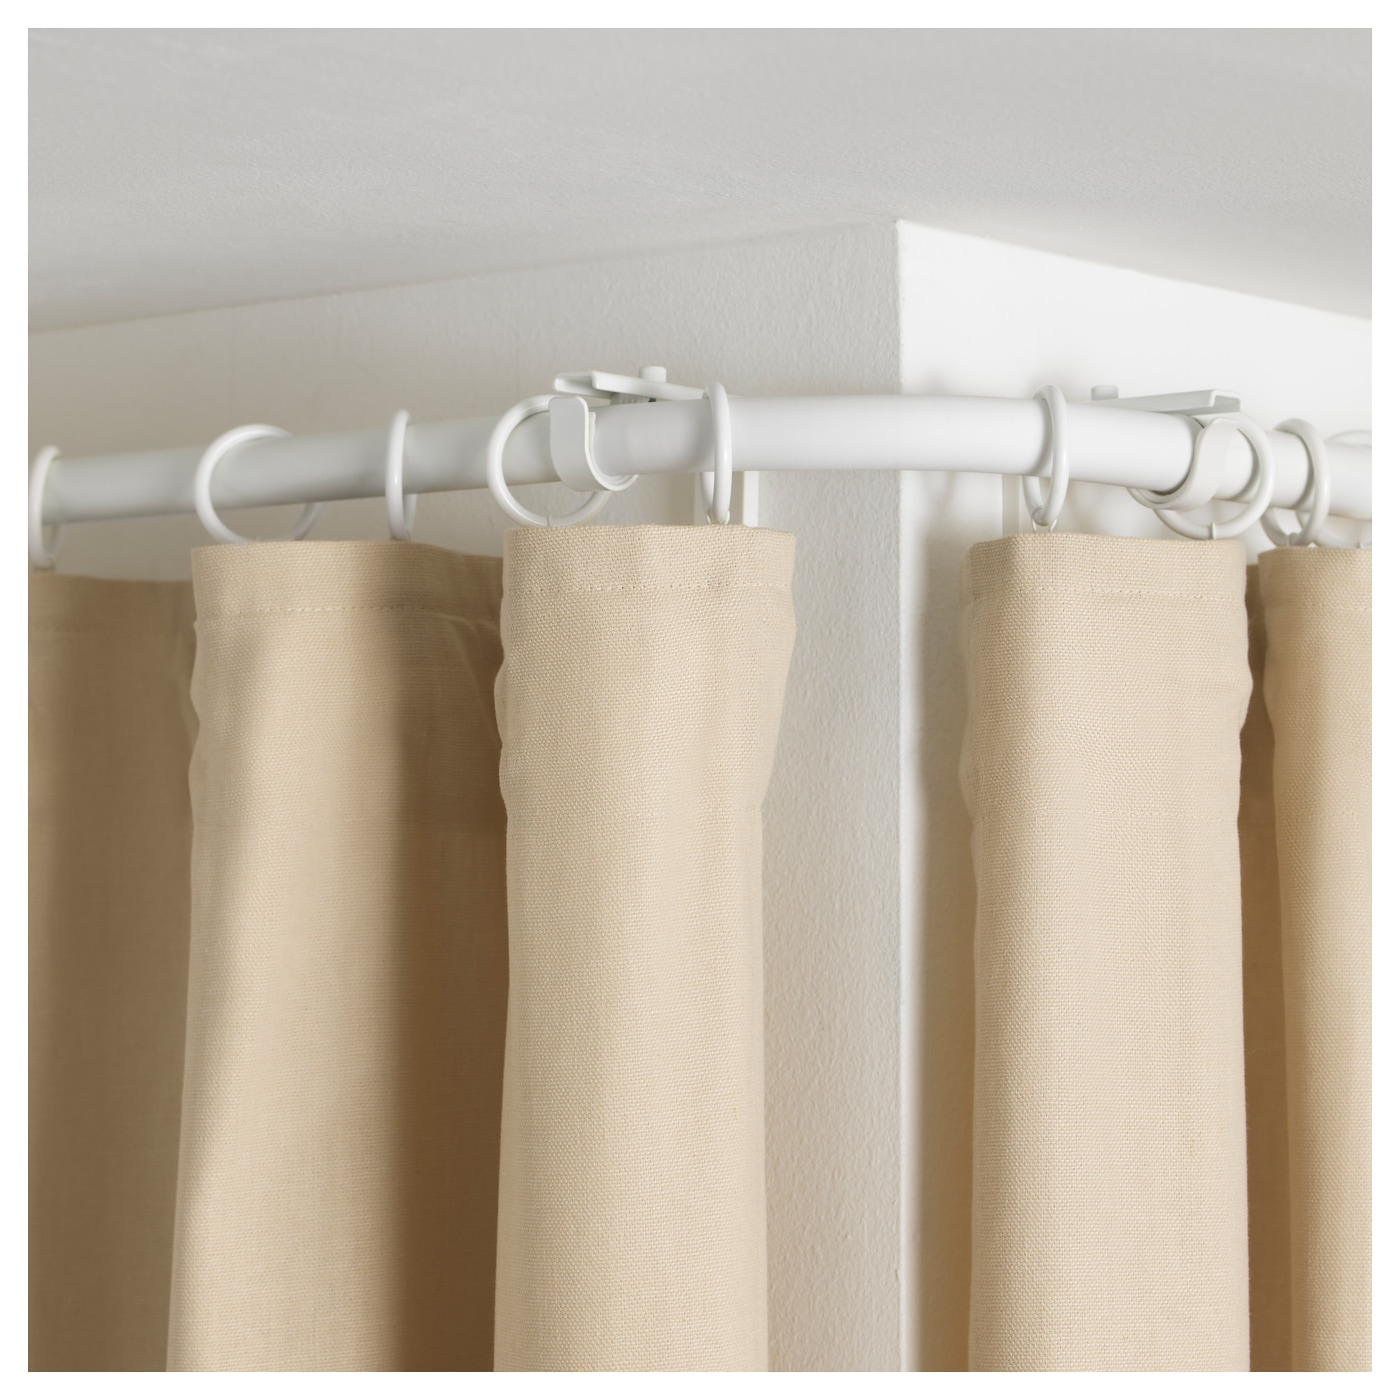 HUGAD Curtain rod corner connector White - IKEA